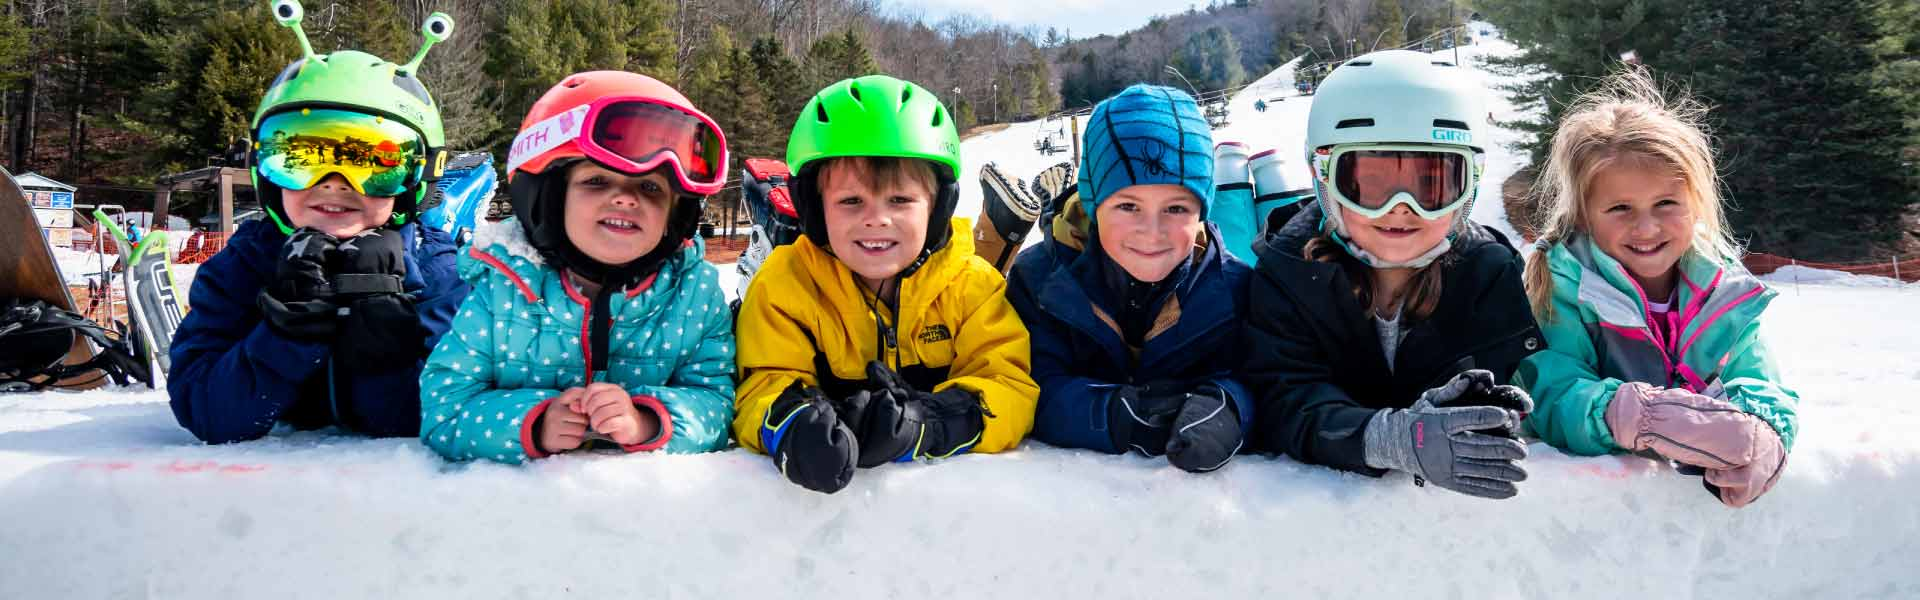 row of kids enjoying the mountain